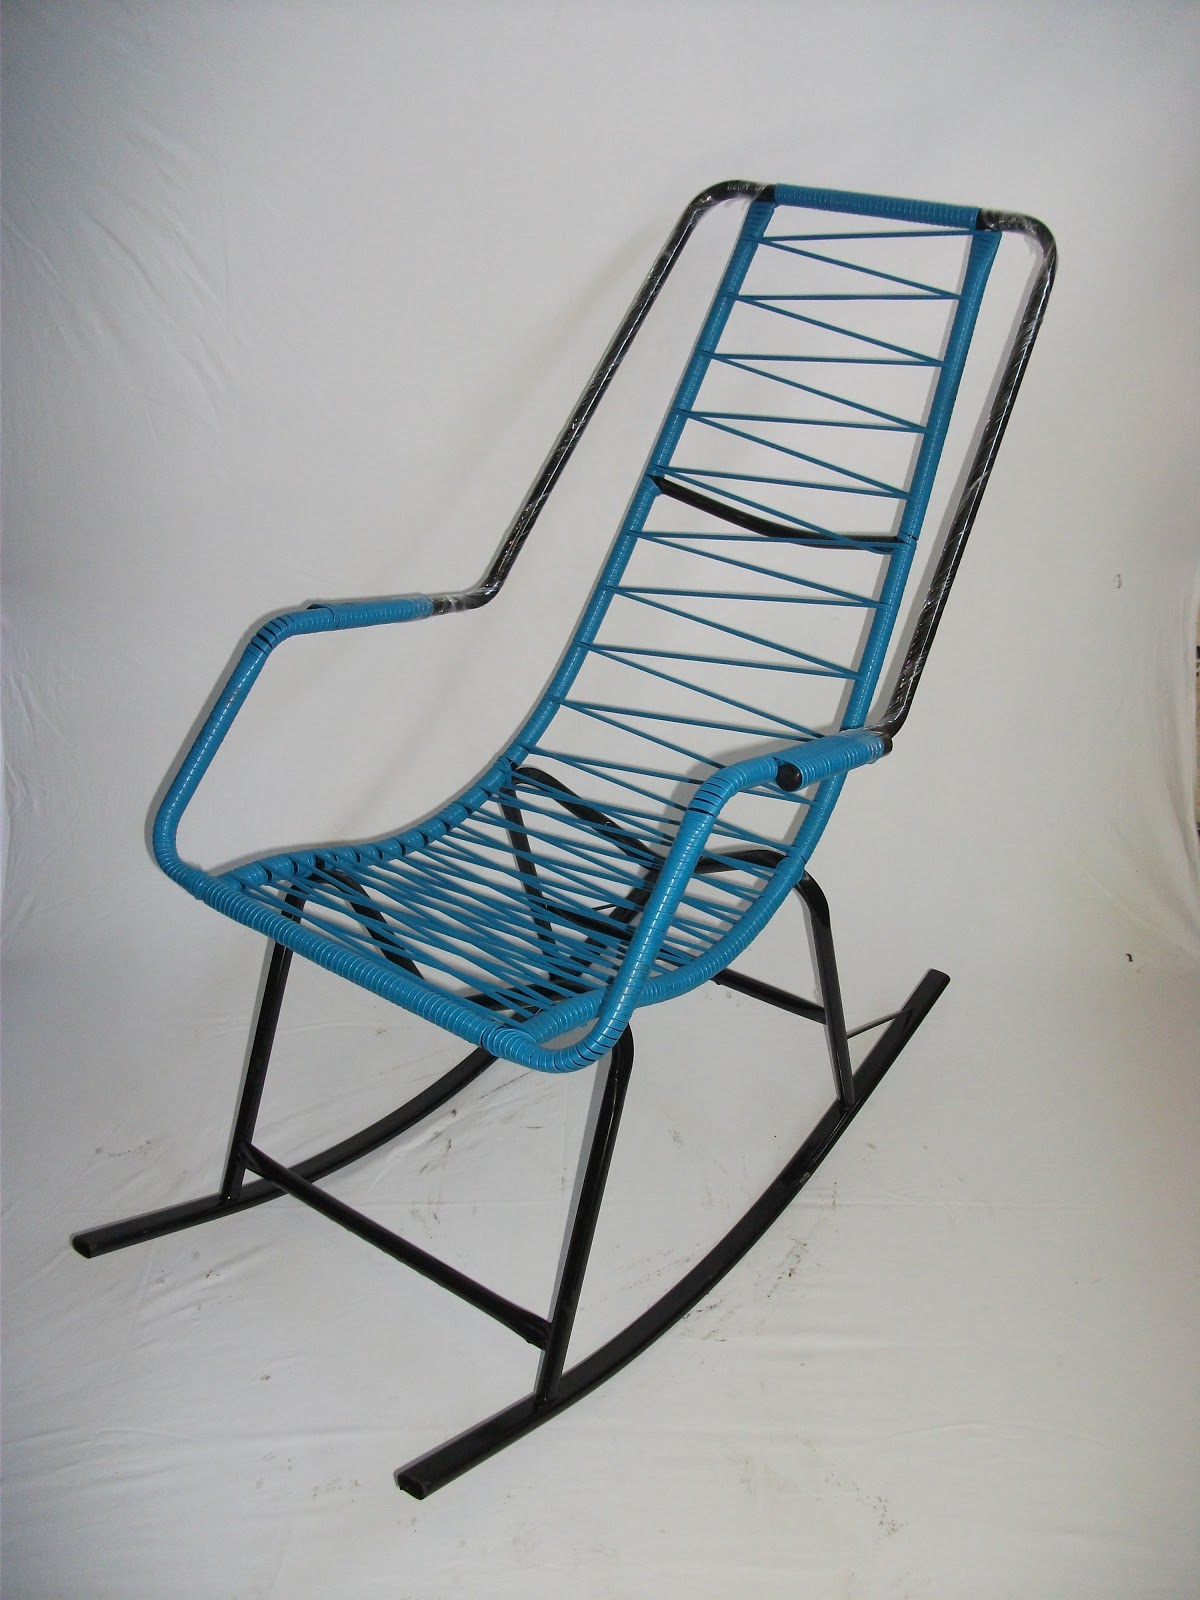 CADEIRAS DE BALANÇO: Cadeiras De Balanço #184C69 1200x1600